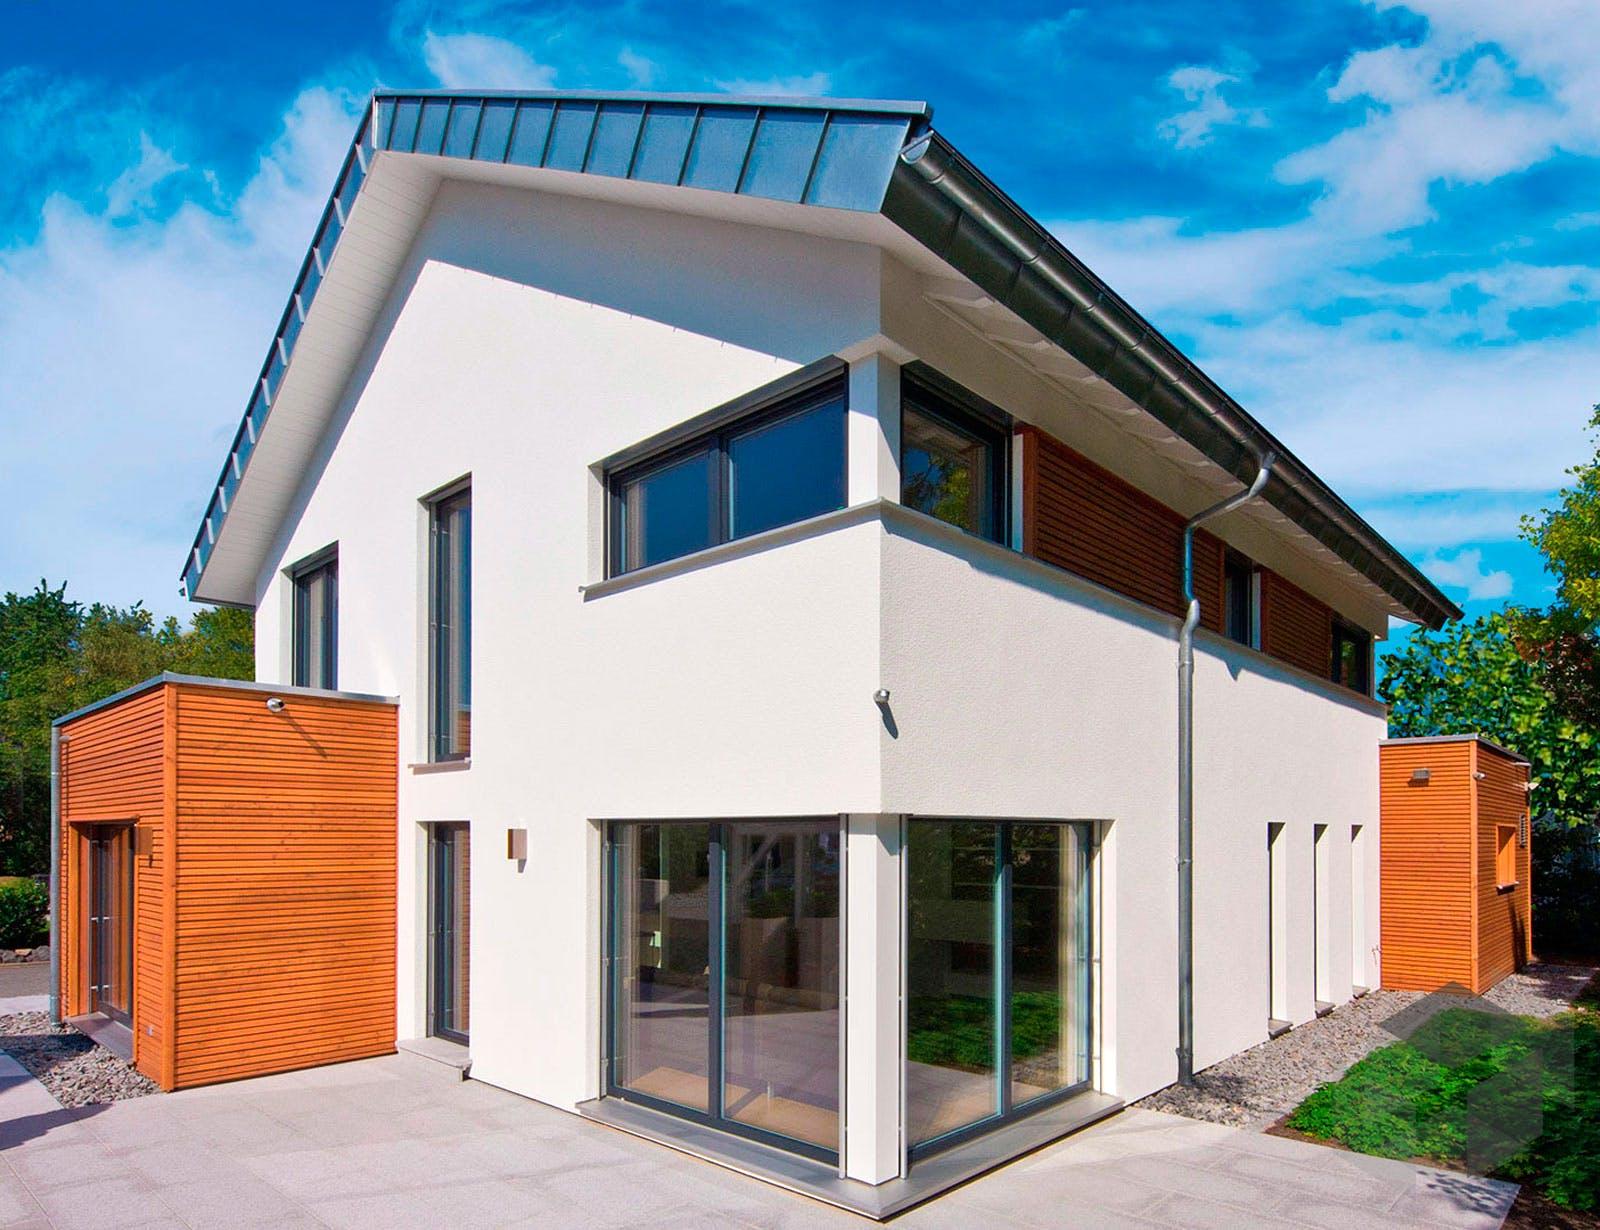 musterhaus future von fertighaus weiss komplette daten bersicht. Black Bedroom Furniture Sets. Home Design Ideas